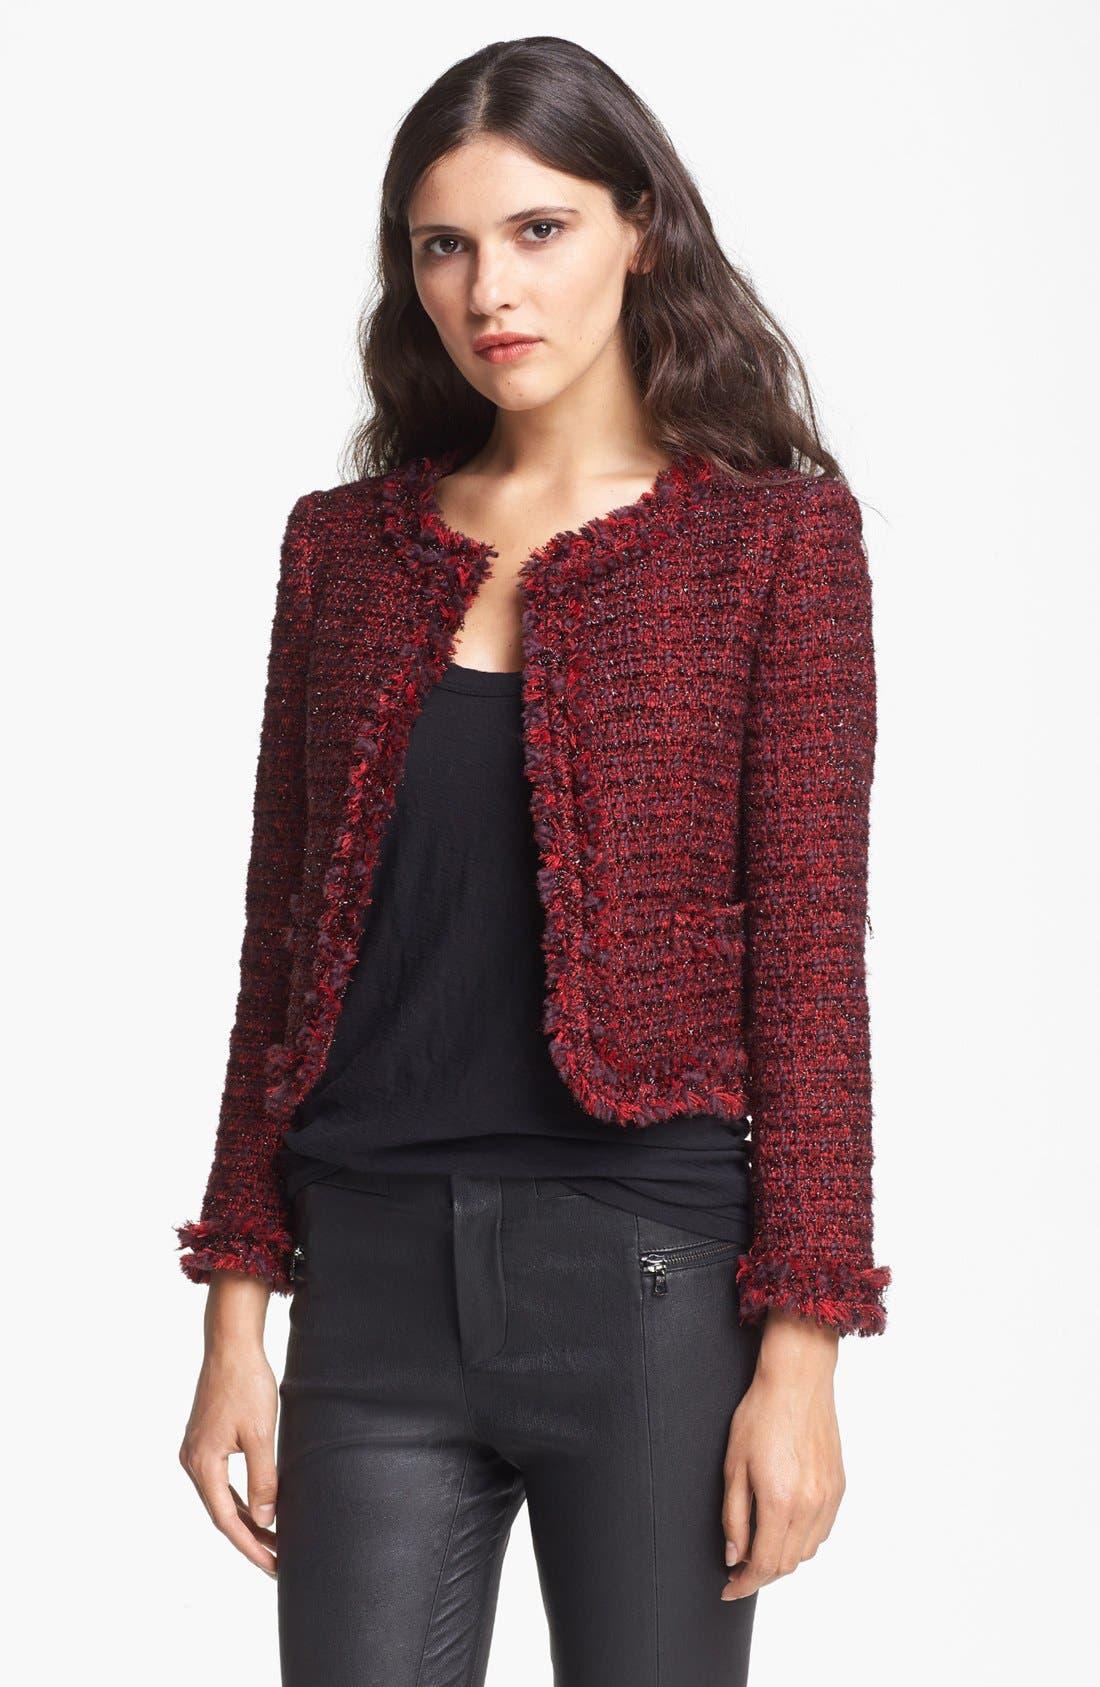 Alternate Image 1 Selected - Alice + Olivia 'Kidman' Tweed Open Front Jacket